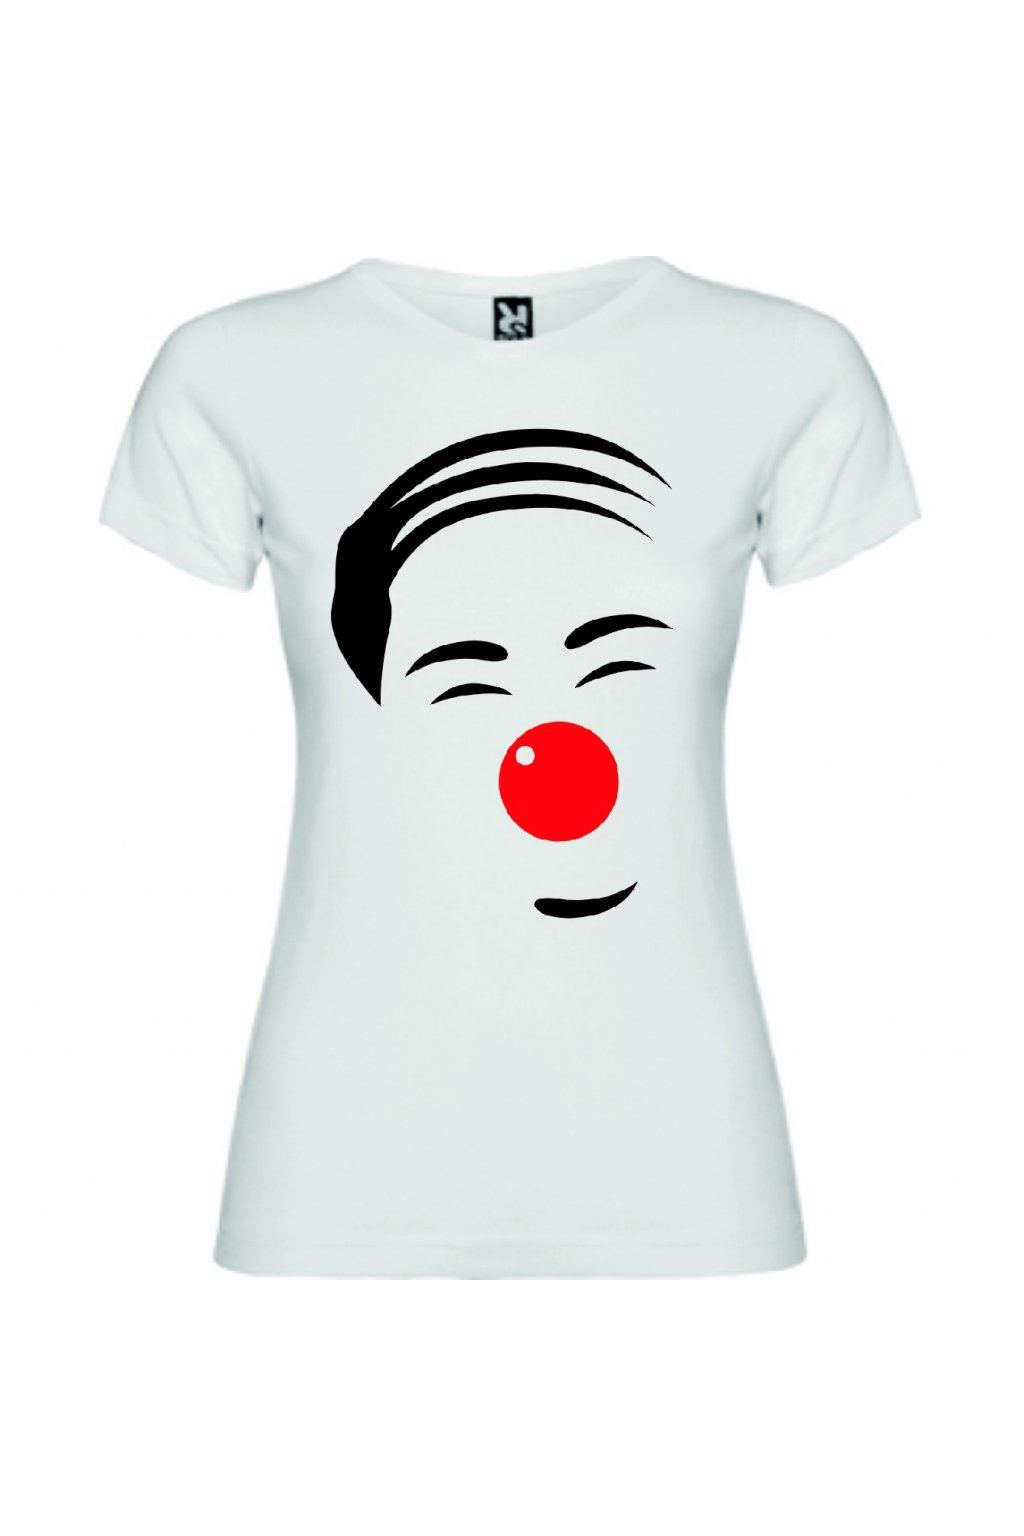 Klaun (V)